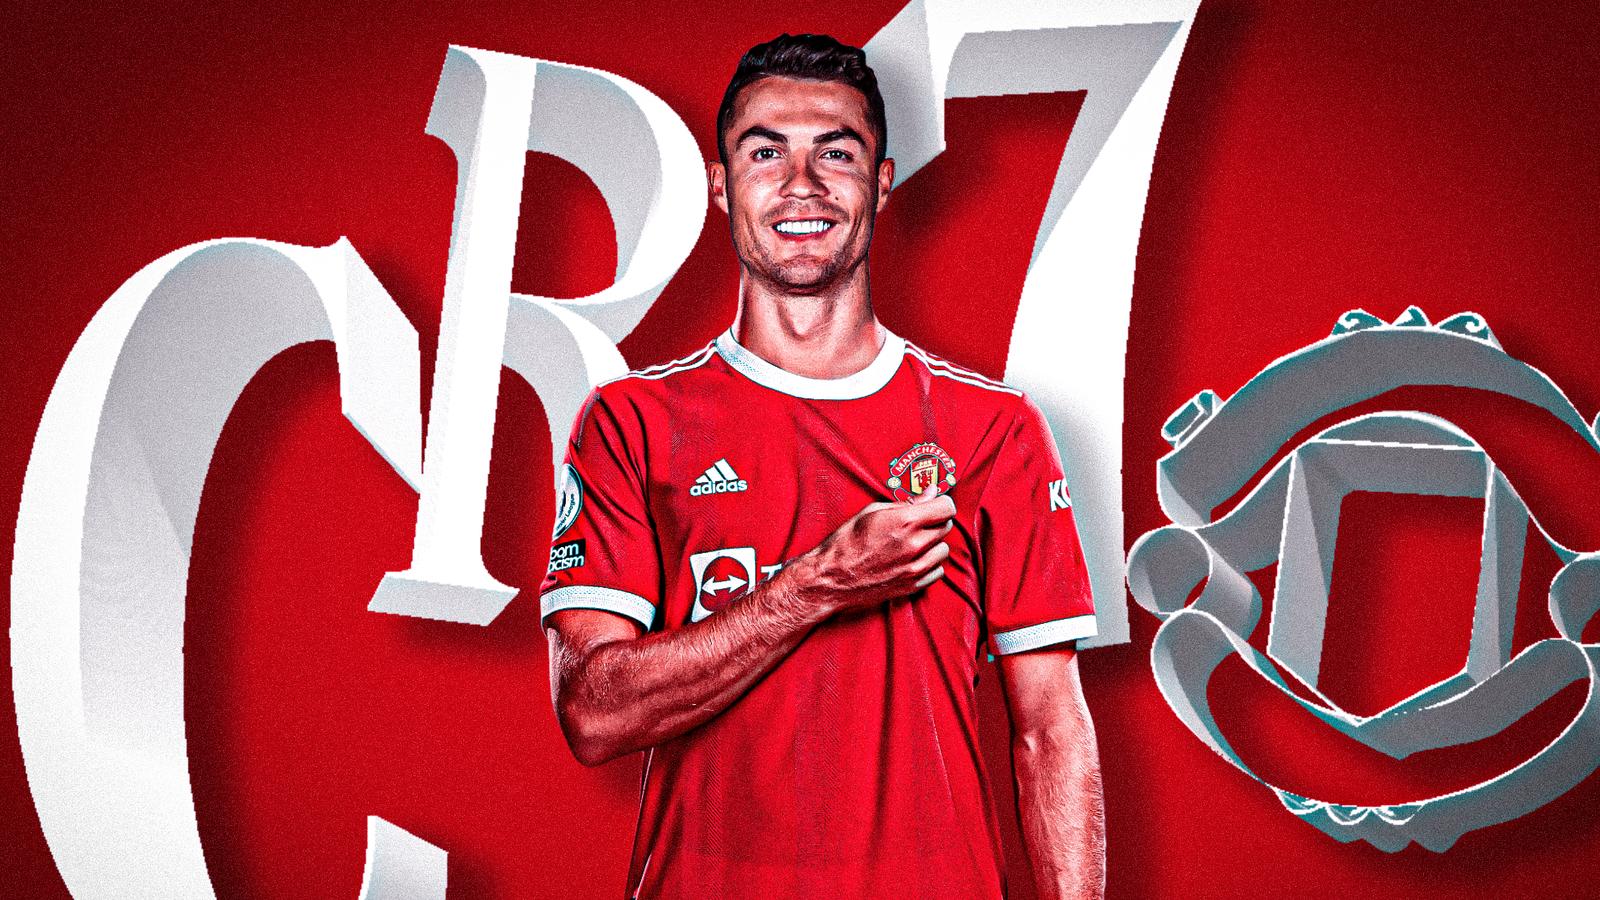 Ronaldo CR7 quay lại MU